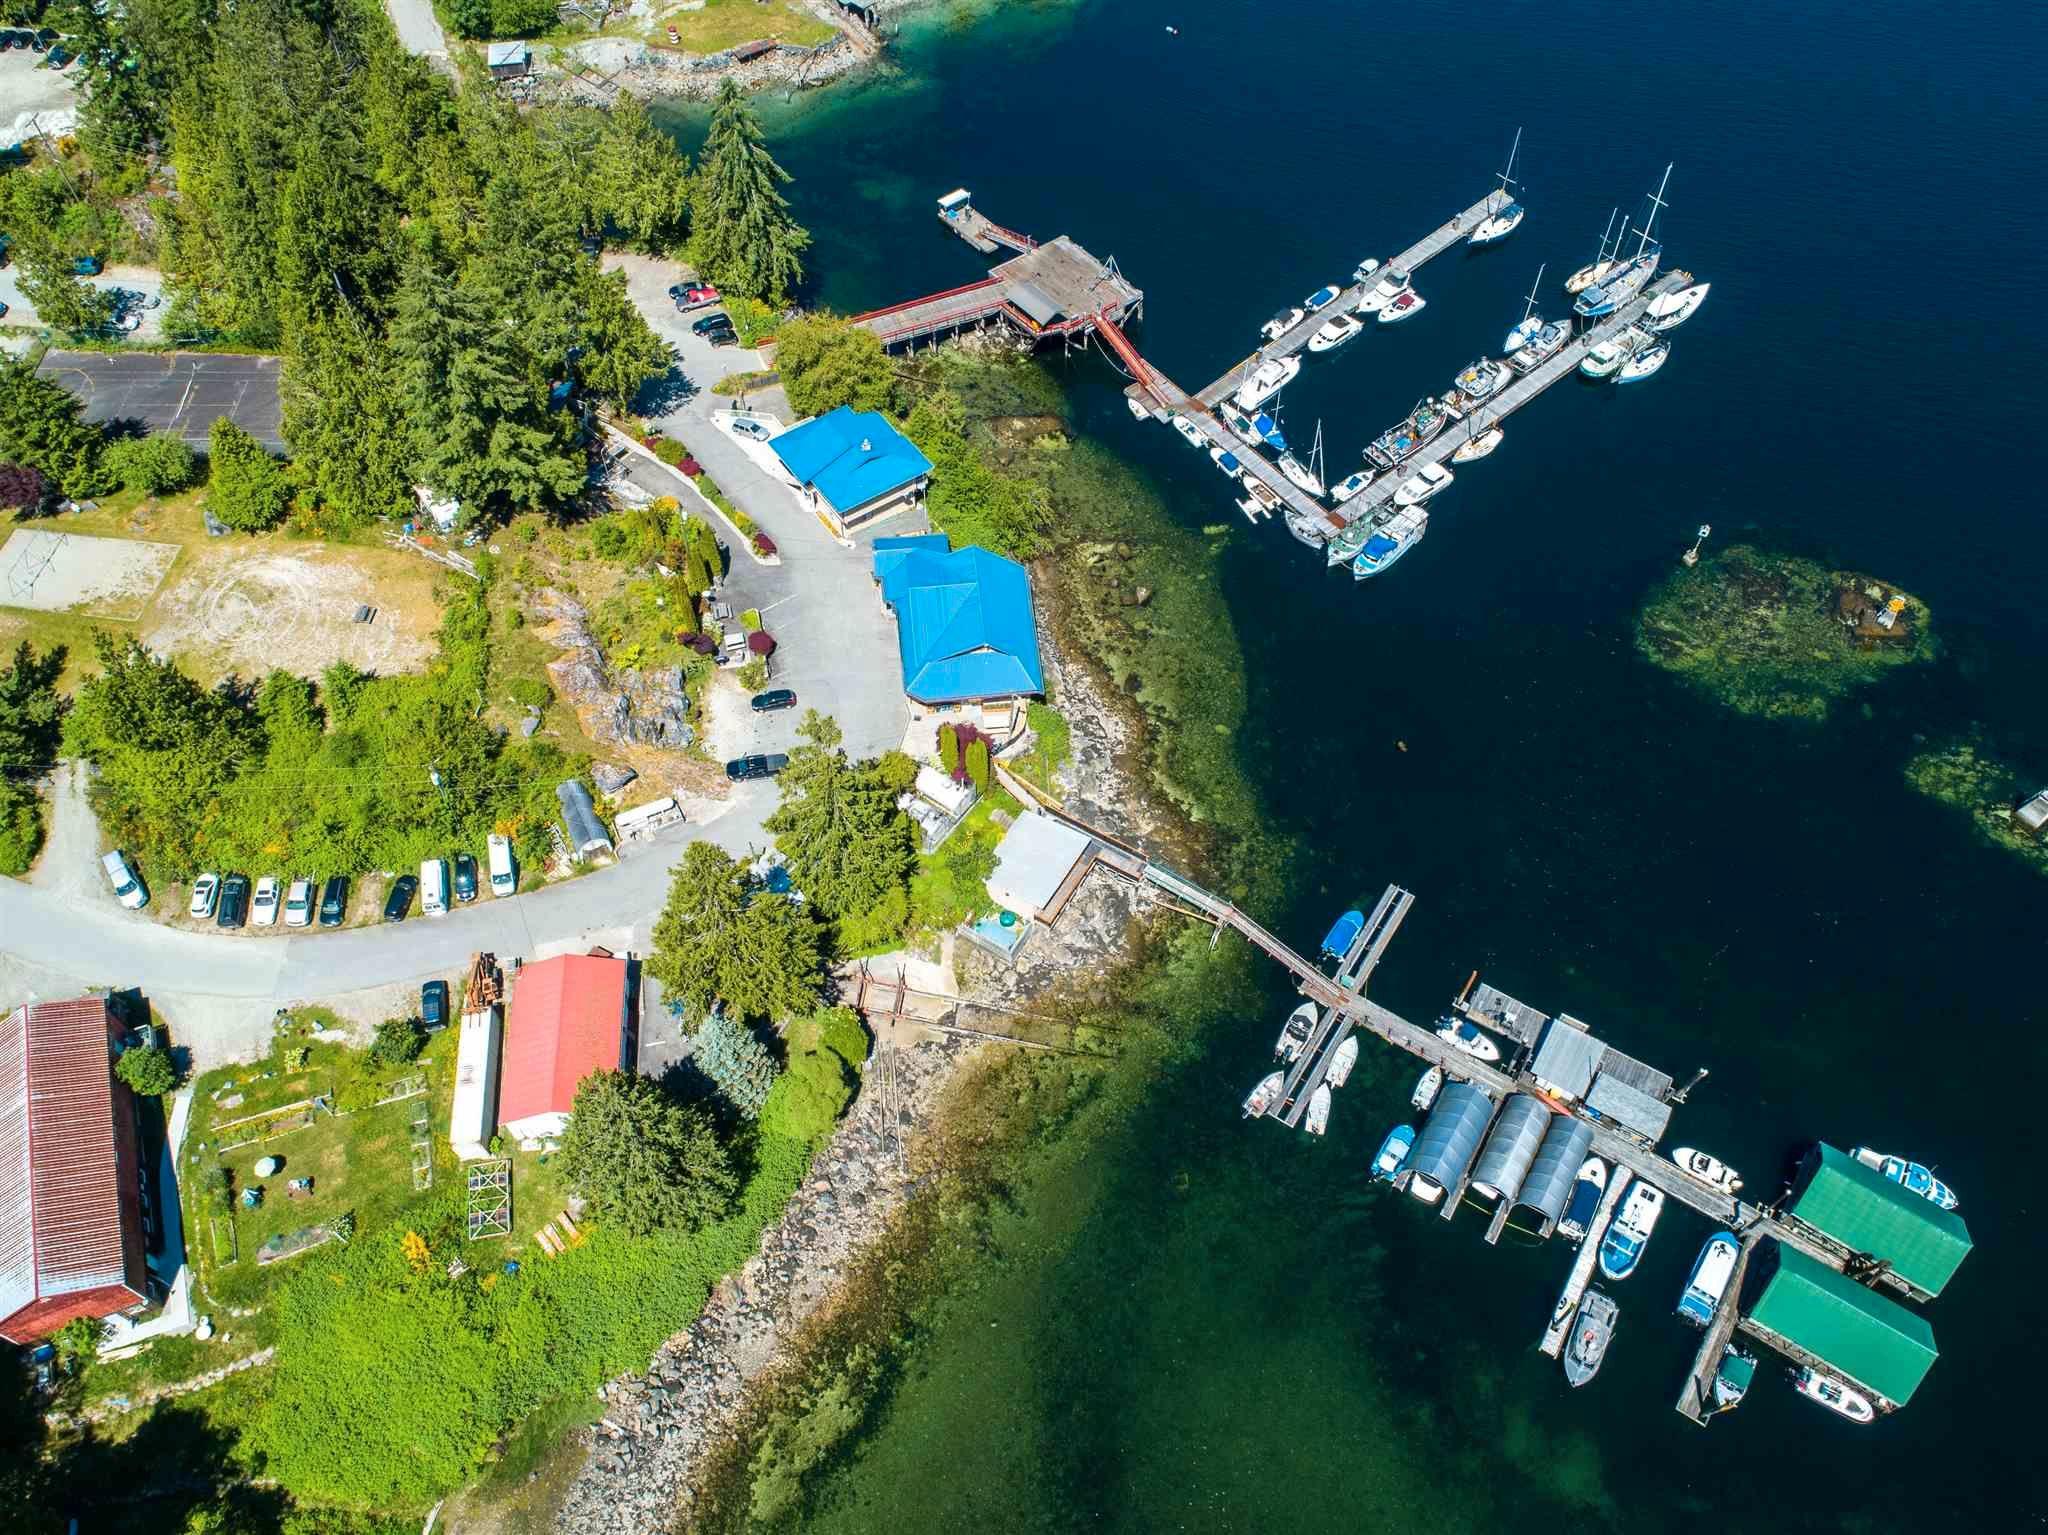 Main Photo: 6781 BATHGATE Road in Egmont: Pender Harbour Egmont House for sale (Sunshine Coast)  : MLS®# R2593981